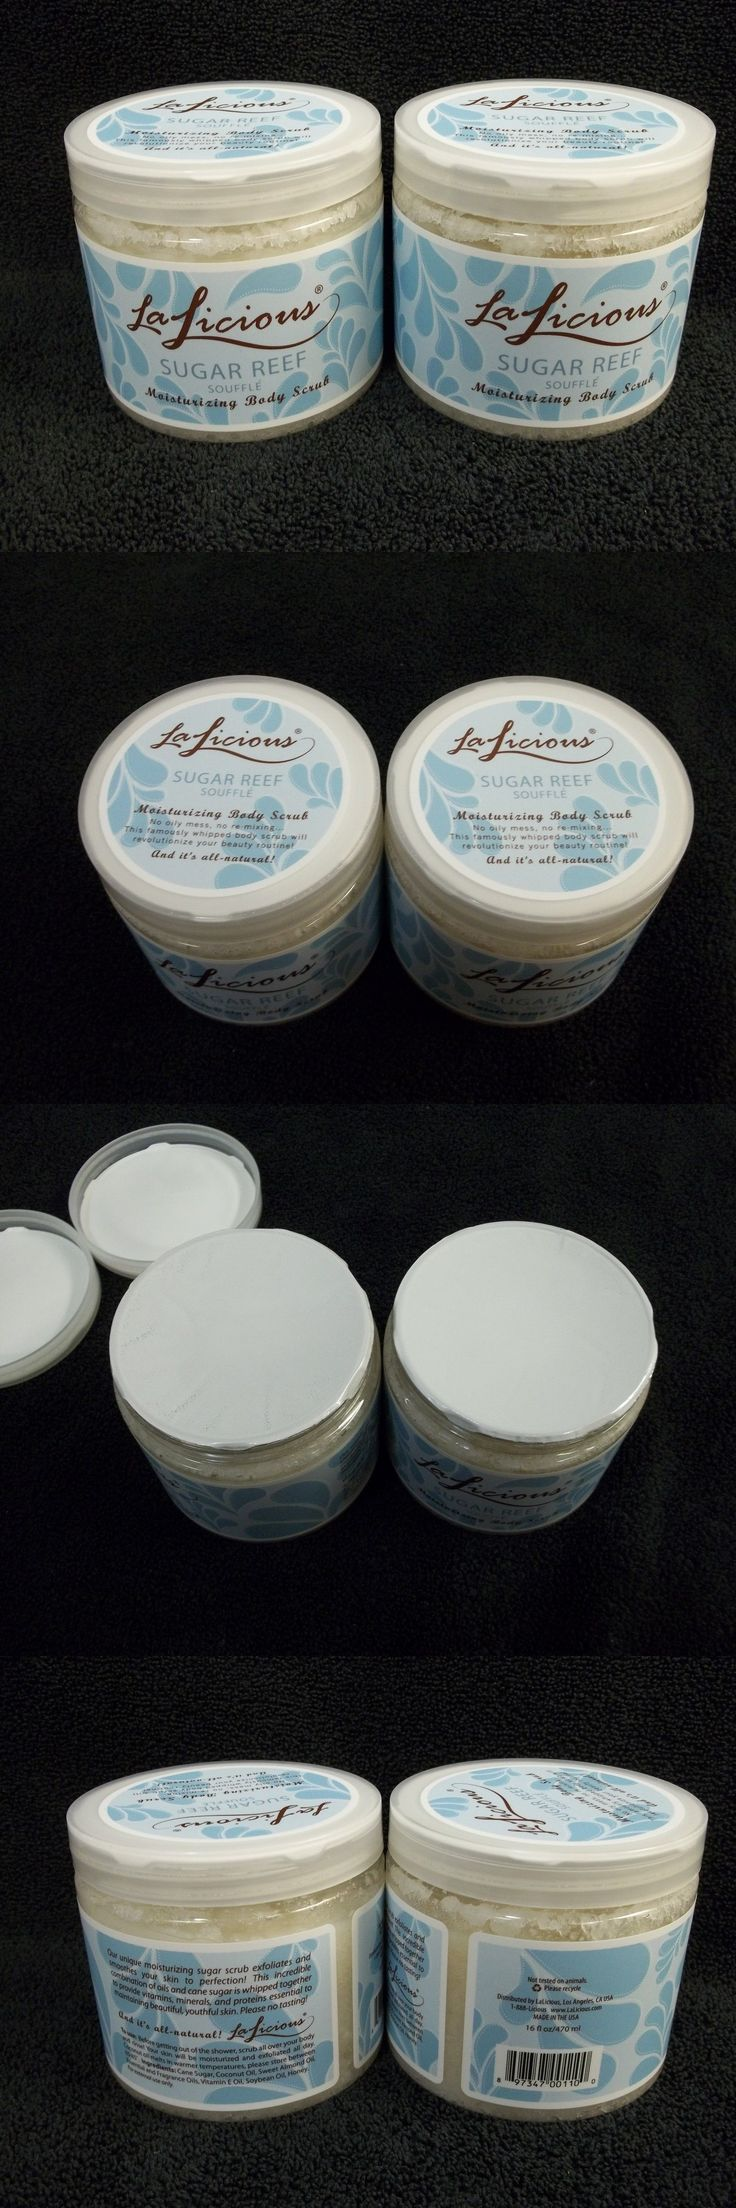 Body Scrubs and Exfoliants: New And Sealed Lalicious Sugar Reef Souffle Moisturizing Body Scrub Two 16 Oz Jars -> BUY IT NOW ONLY: $58.88 on eBay!